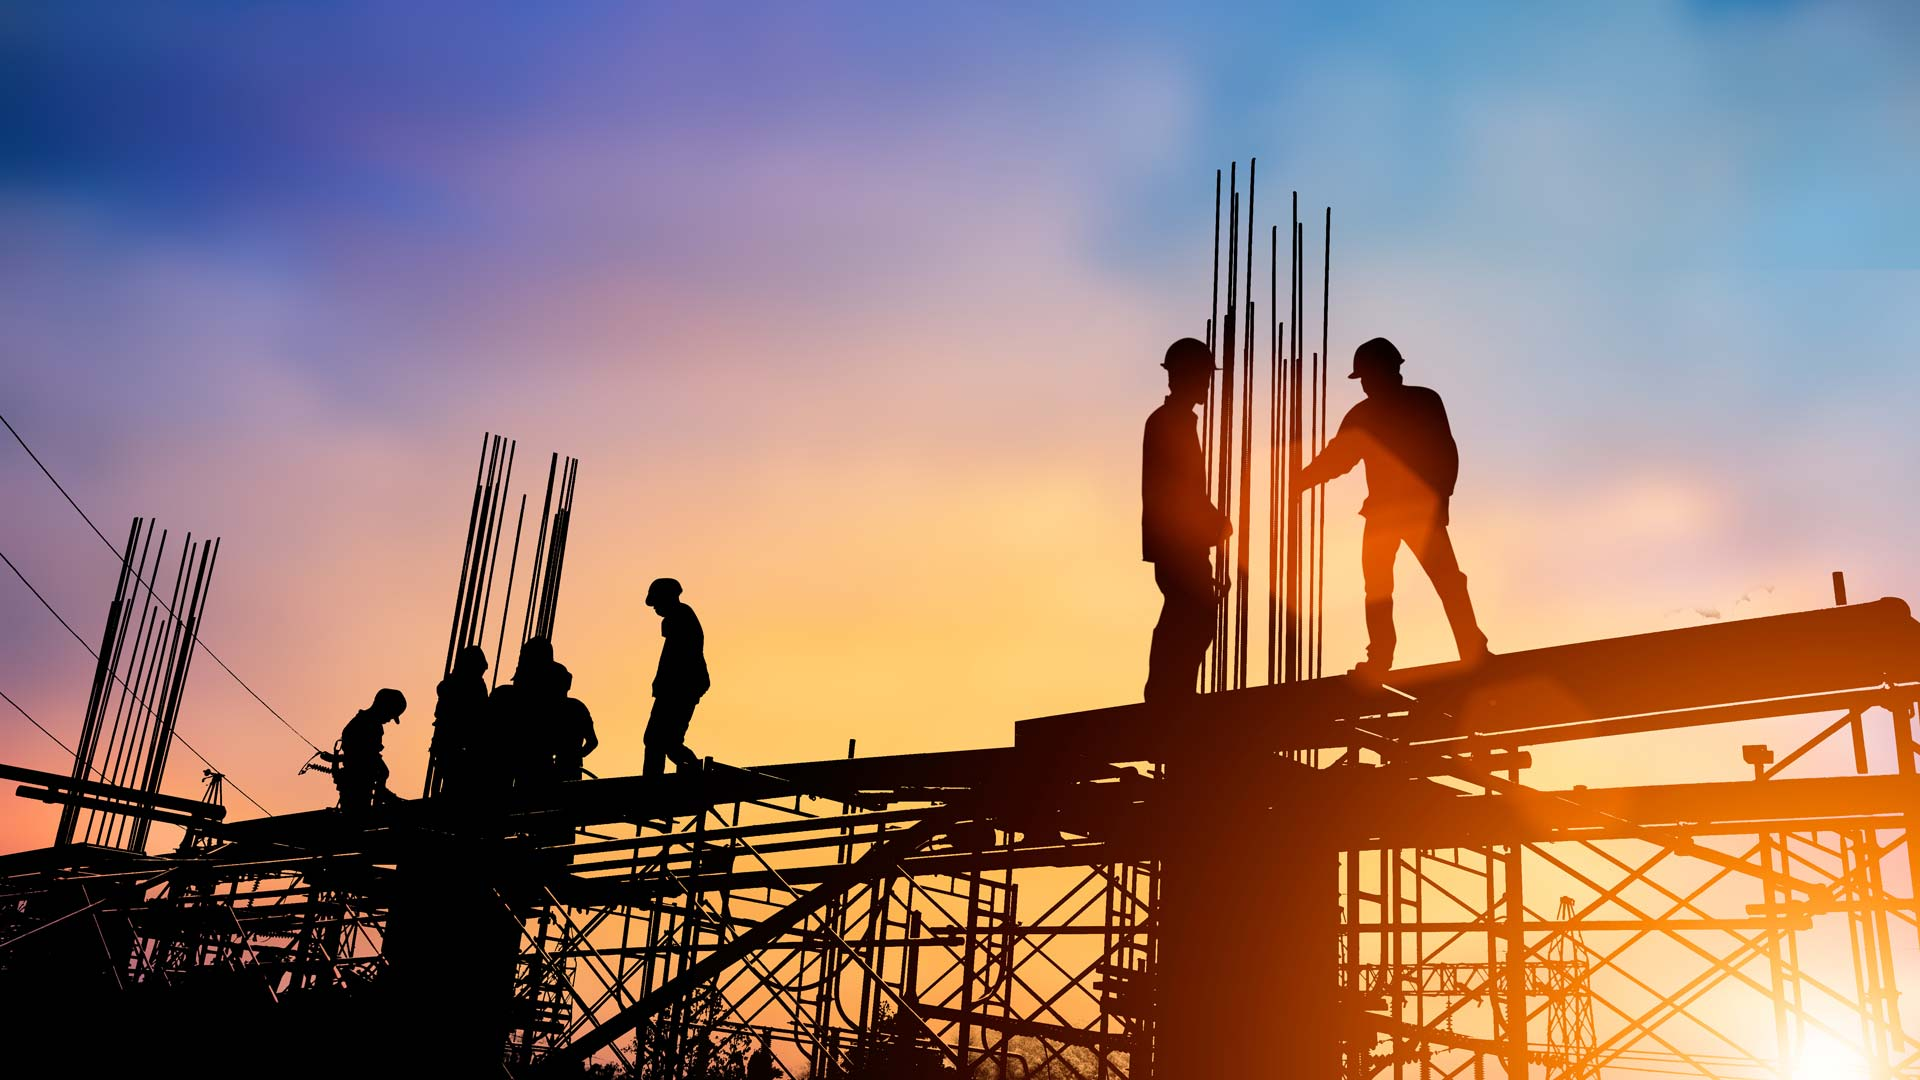 Trades / Construction Insurance Toronto